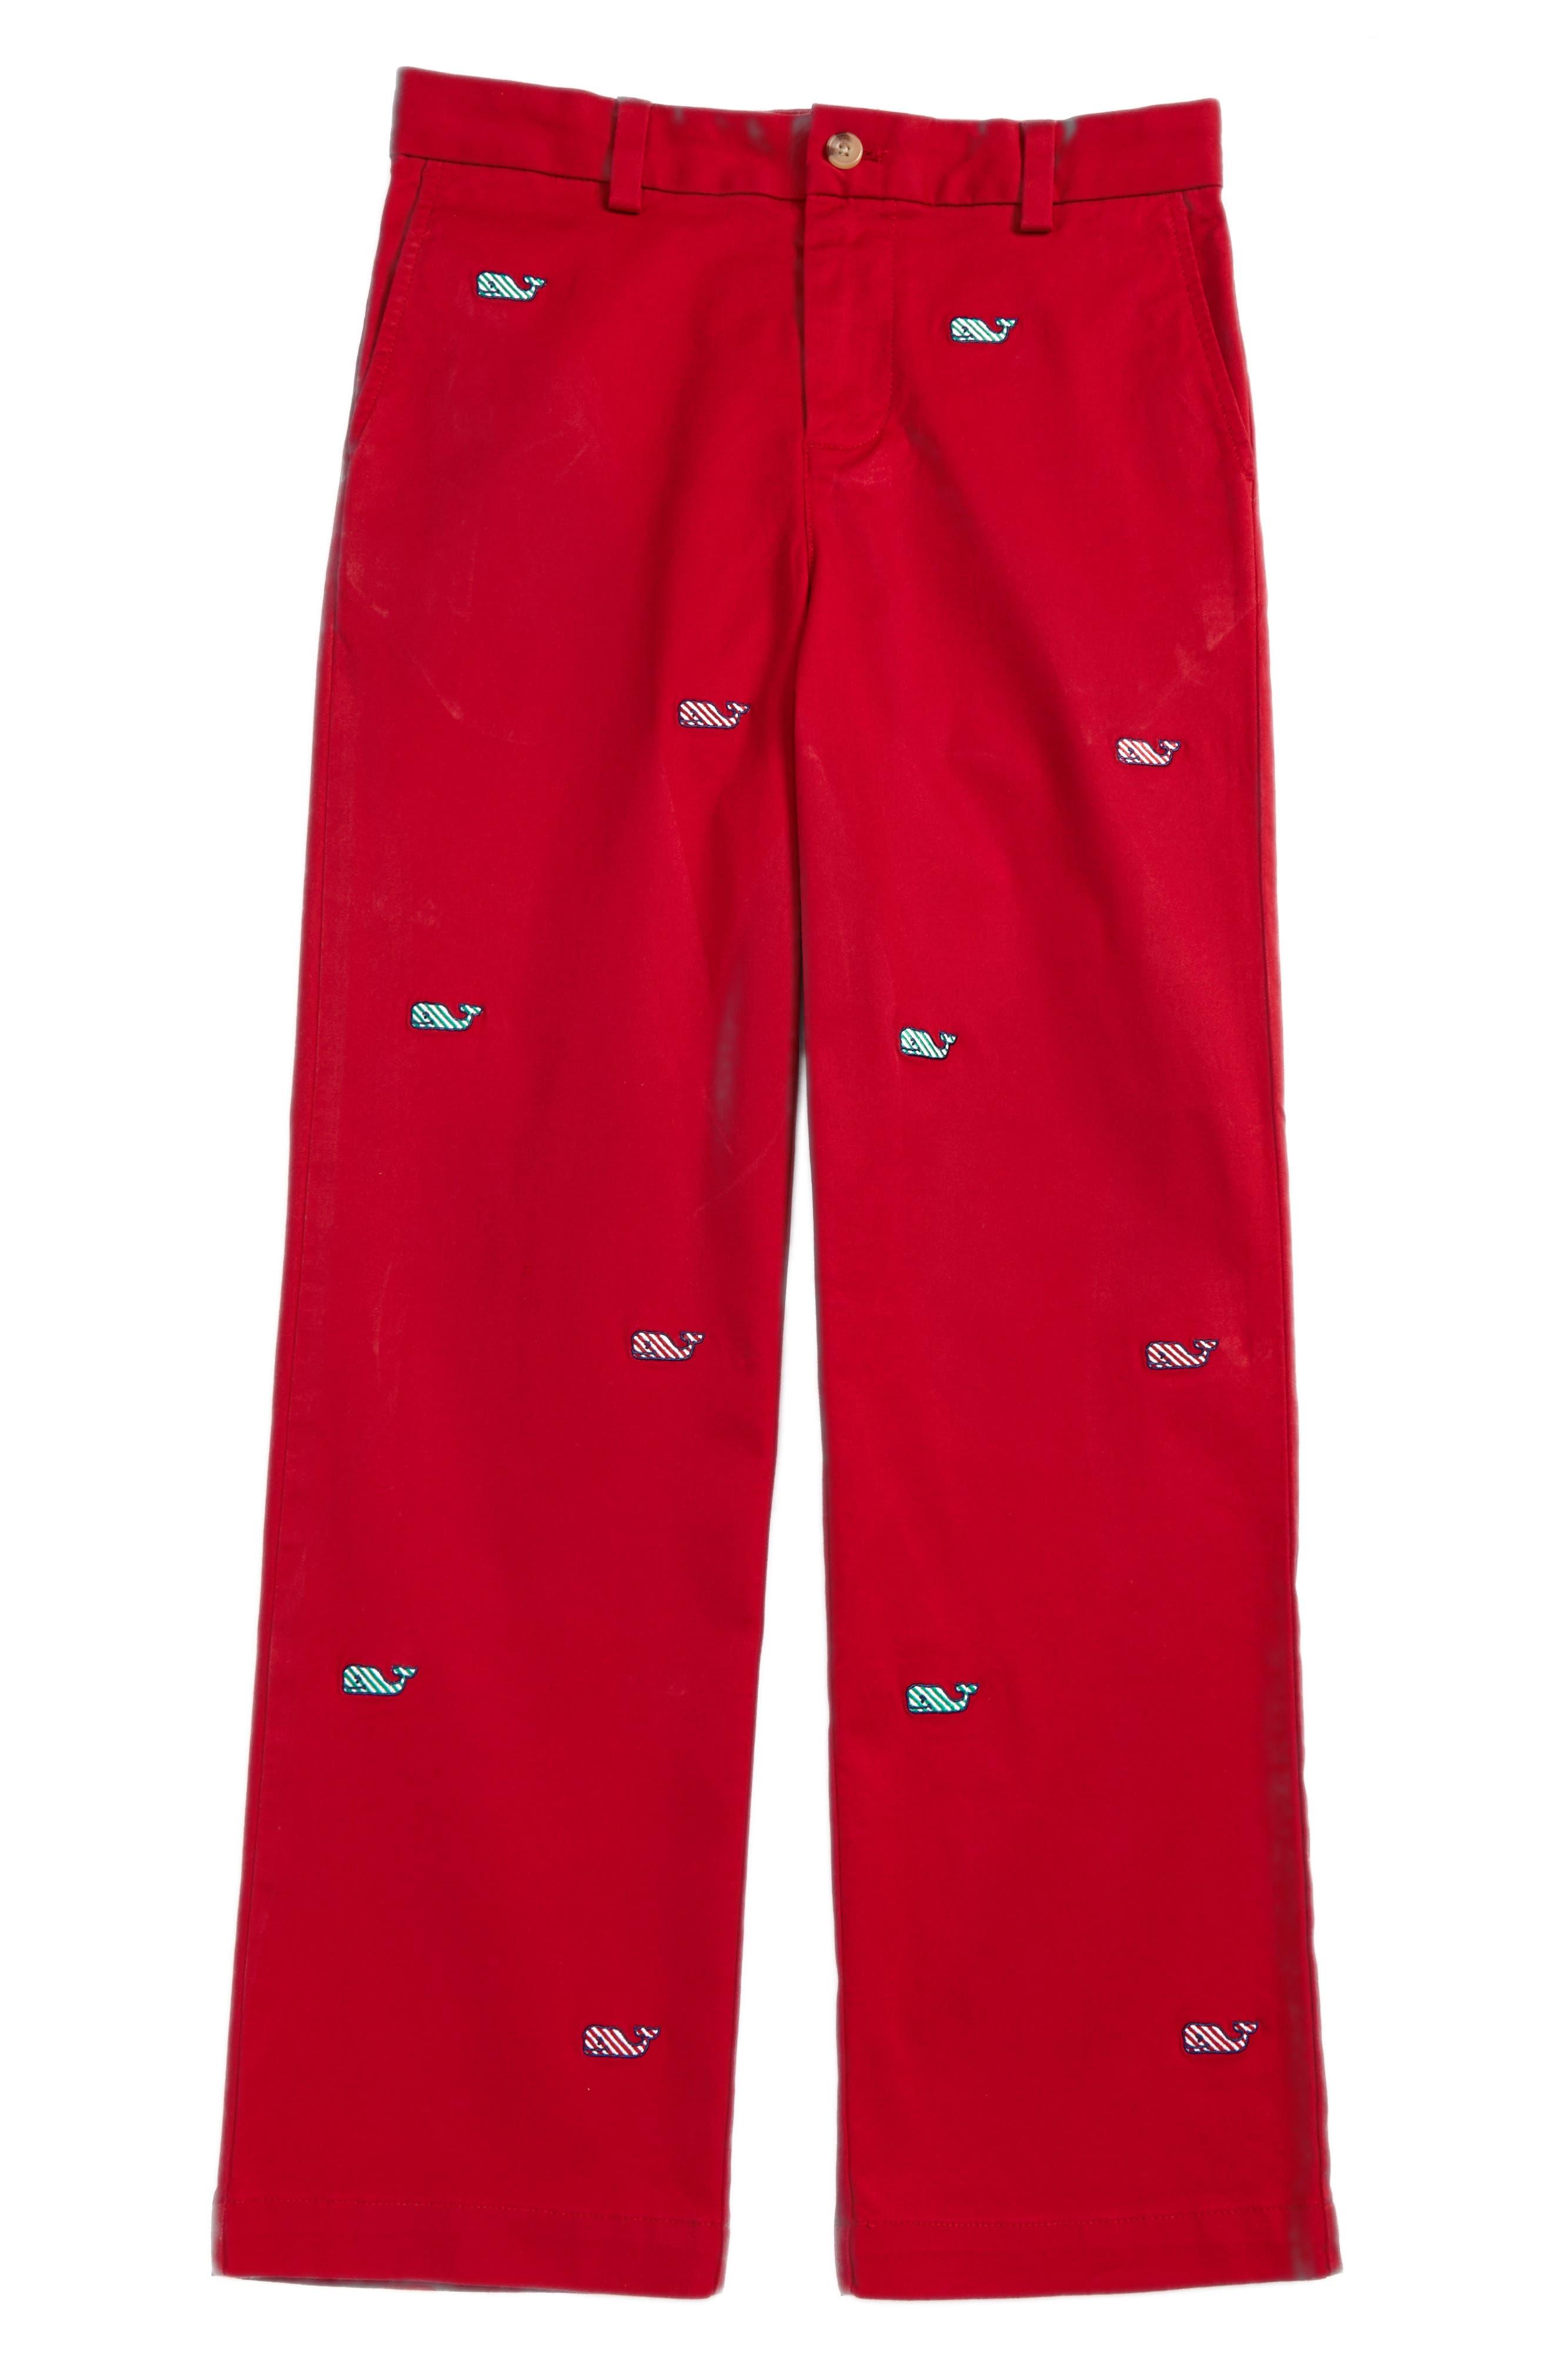 Candy Cane Whale Breaker Pants,                             Main thumbnail 1, color,